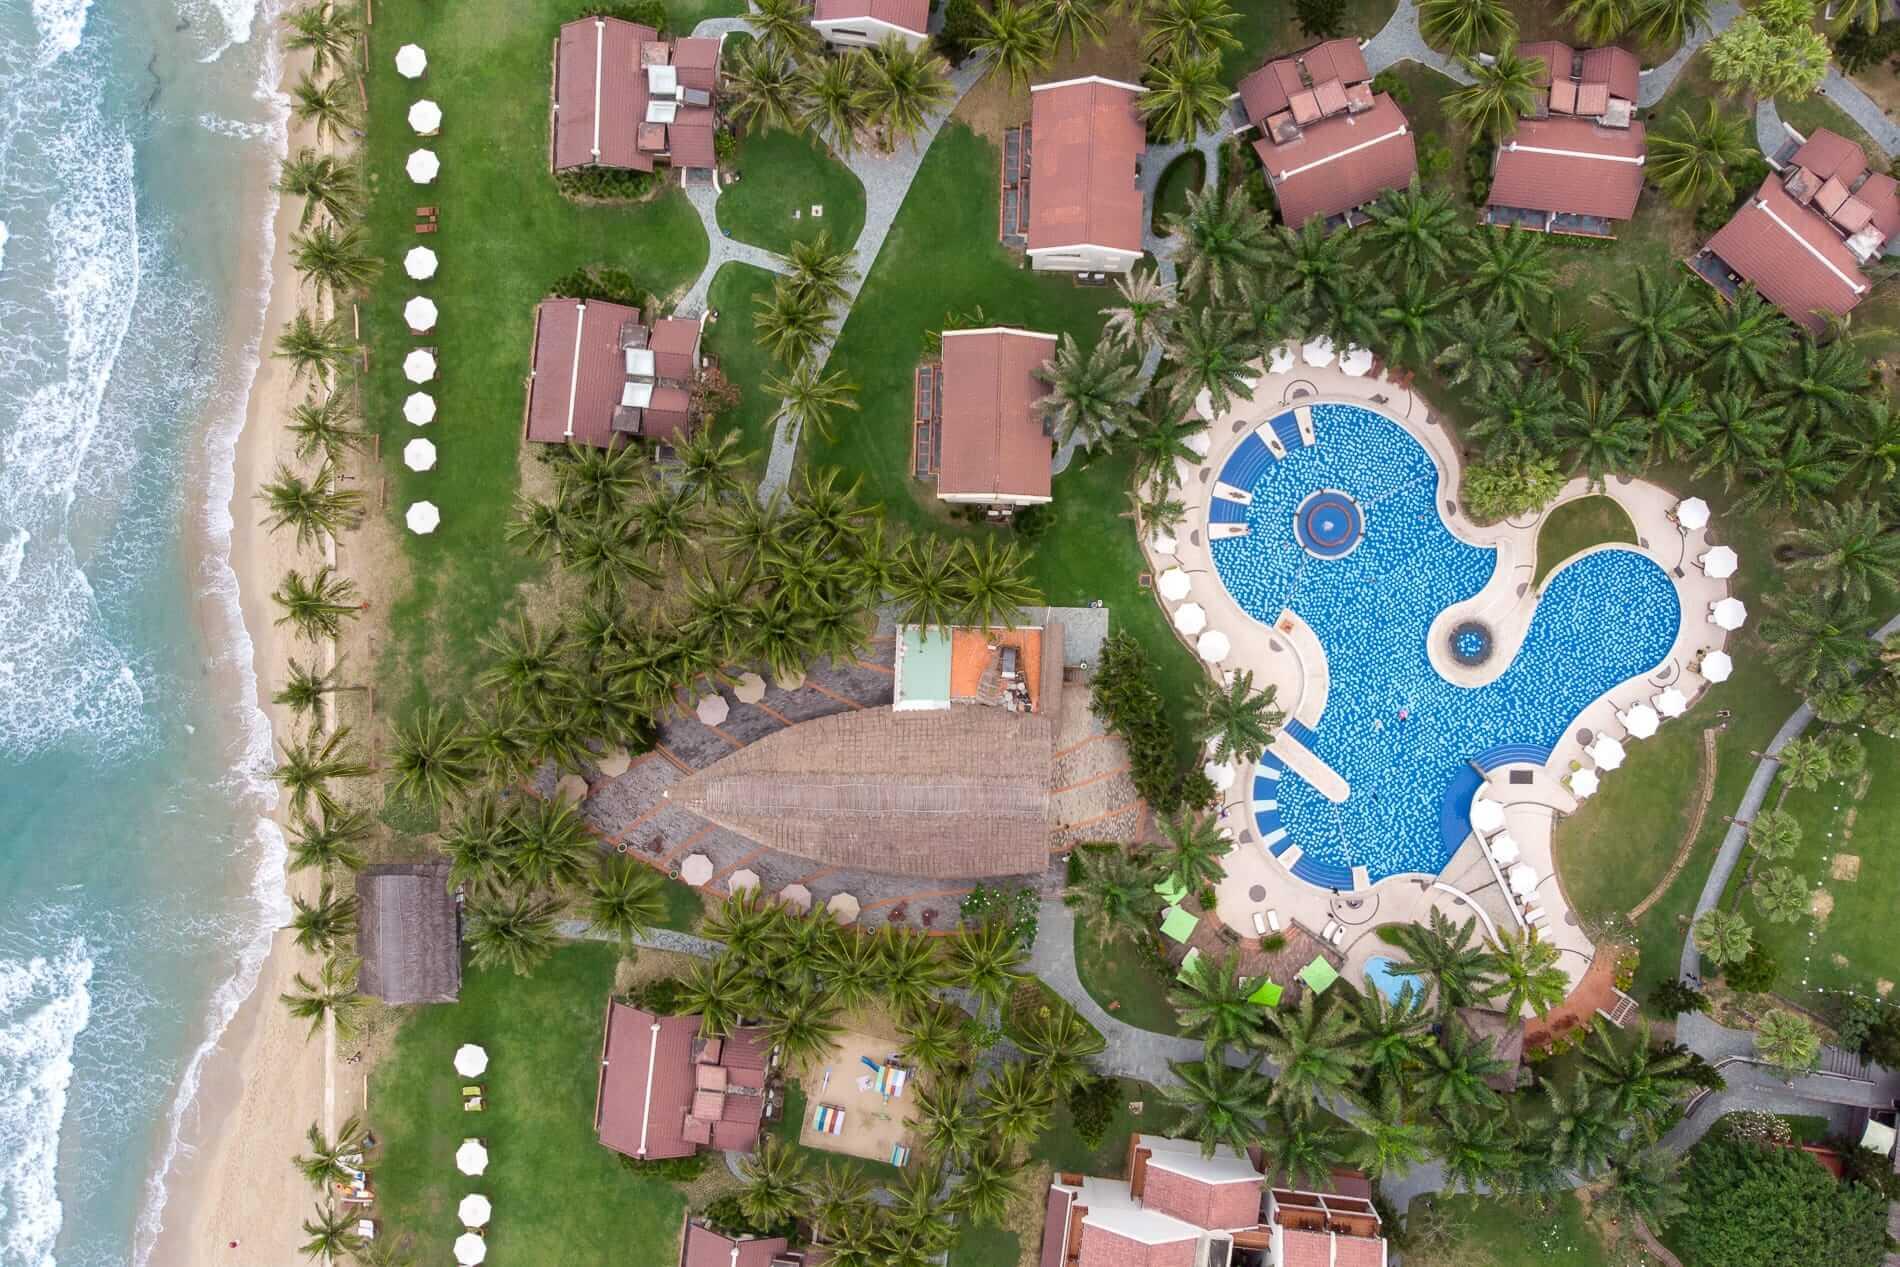 Drone view of The Palm Garden Resort - Hoi An Beach Resorts